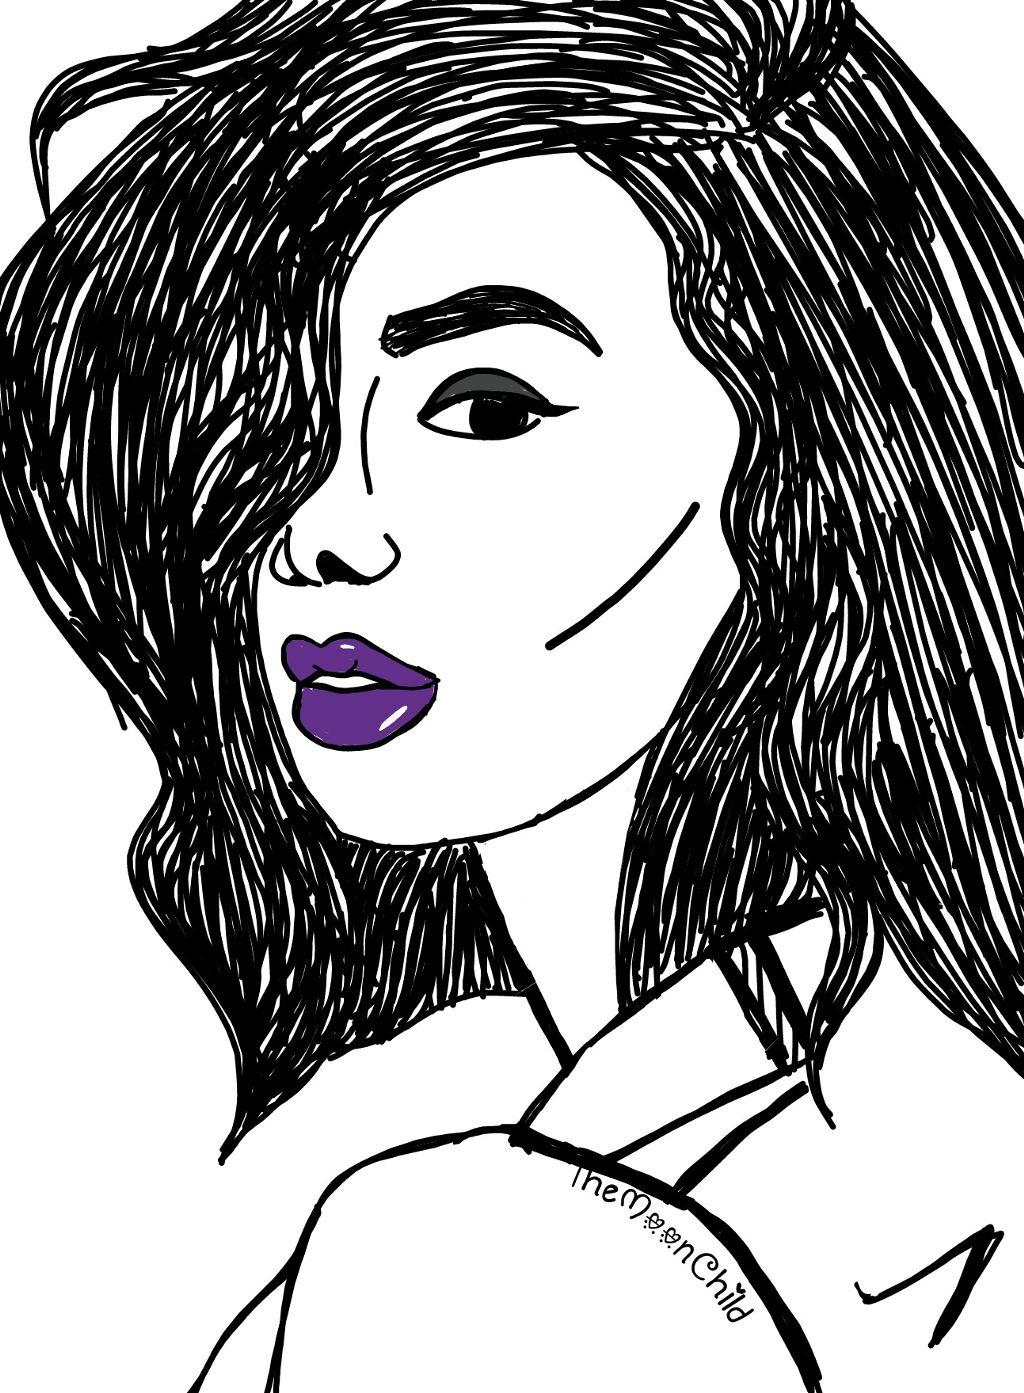 Draw Art Friends Girl Tumblr Cute Lips Blackandwhite